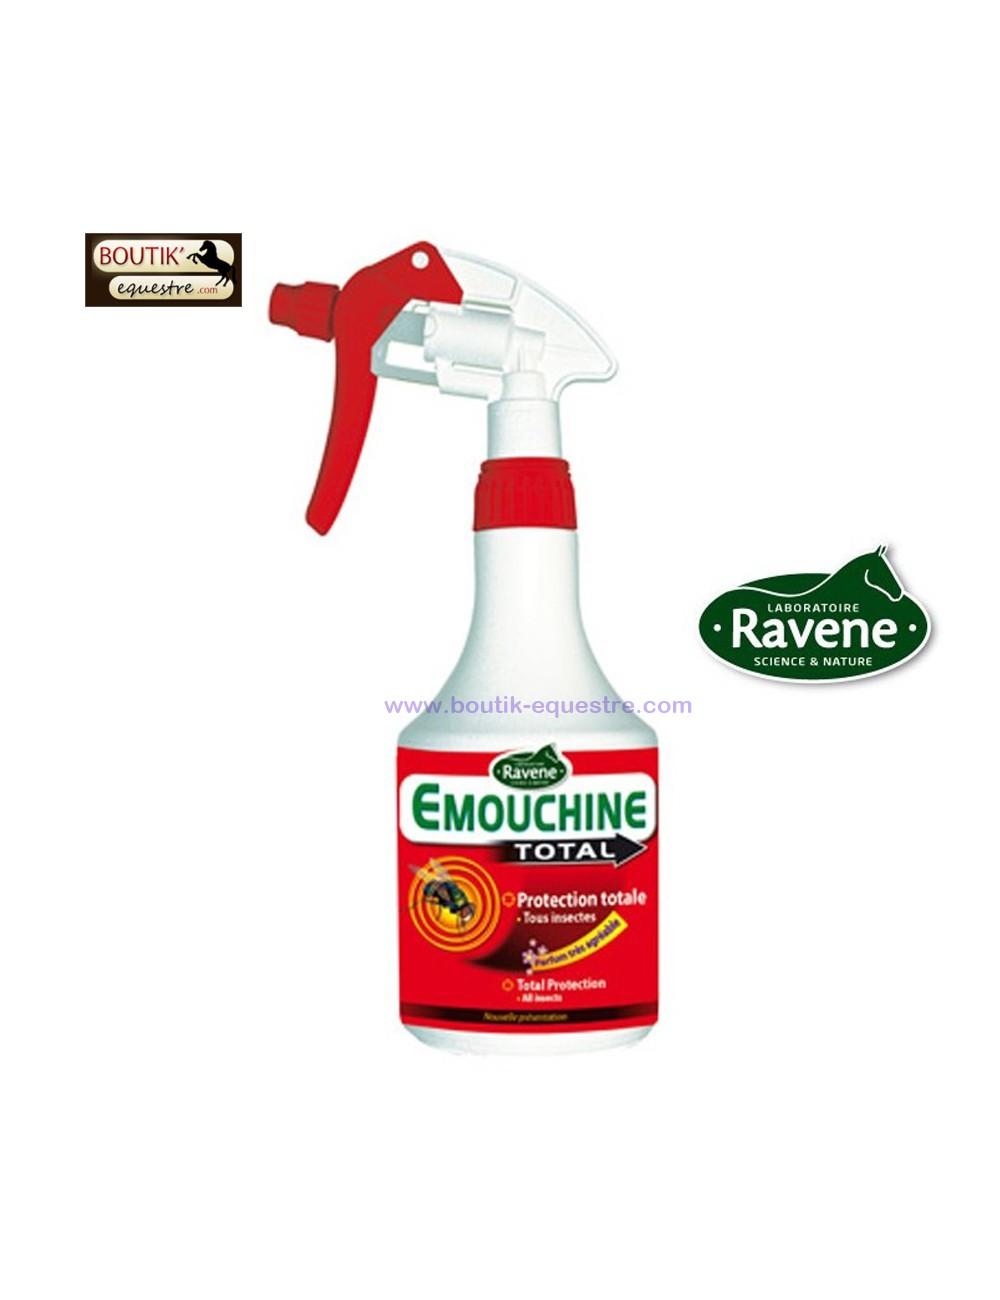 Emouchine Total RAVENE